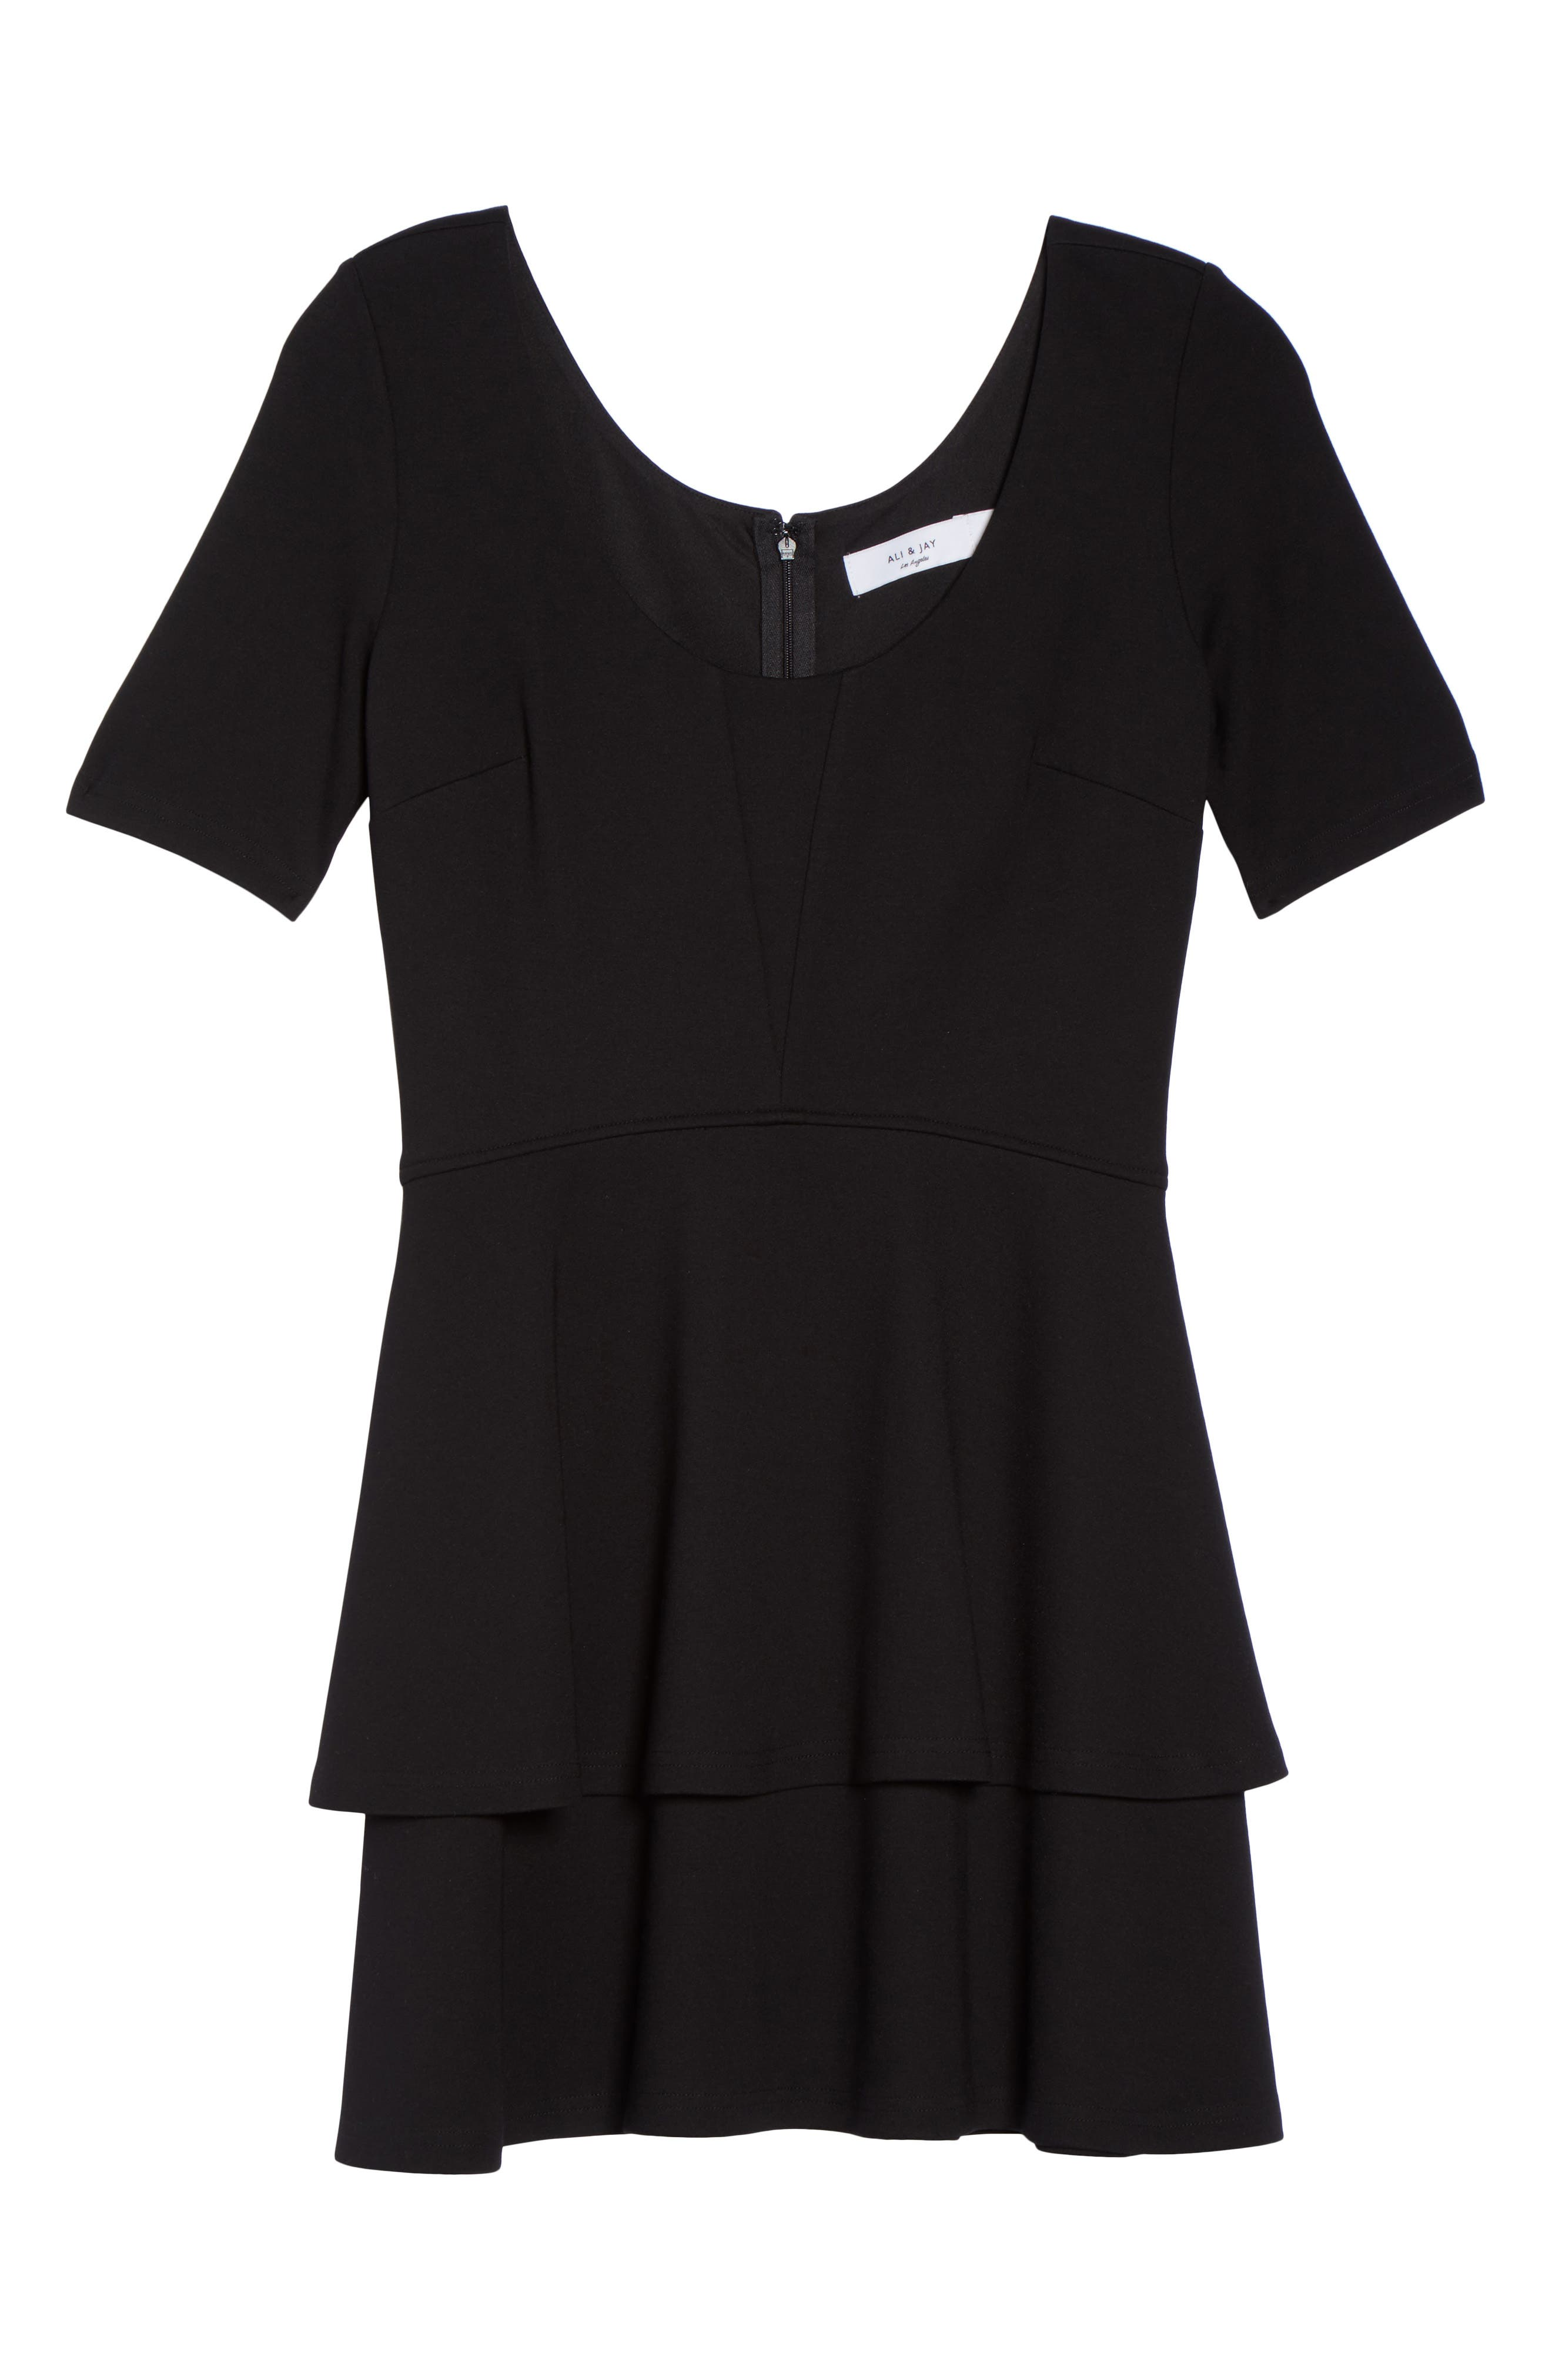 Isn't It Sweet Fit & Flare Dress,                             Alternate thumbnail 6, color,                             001